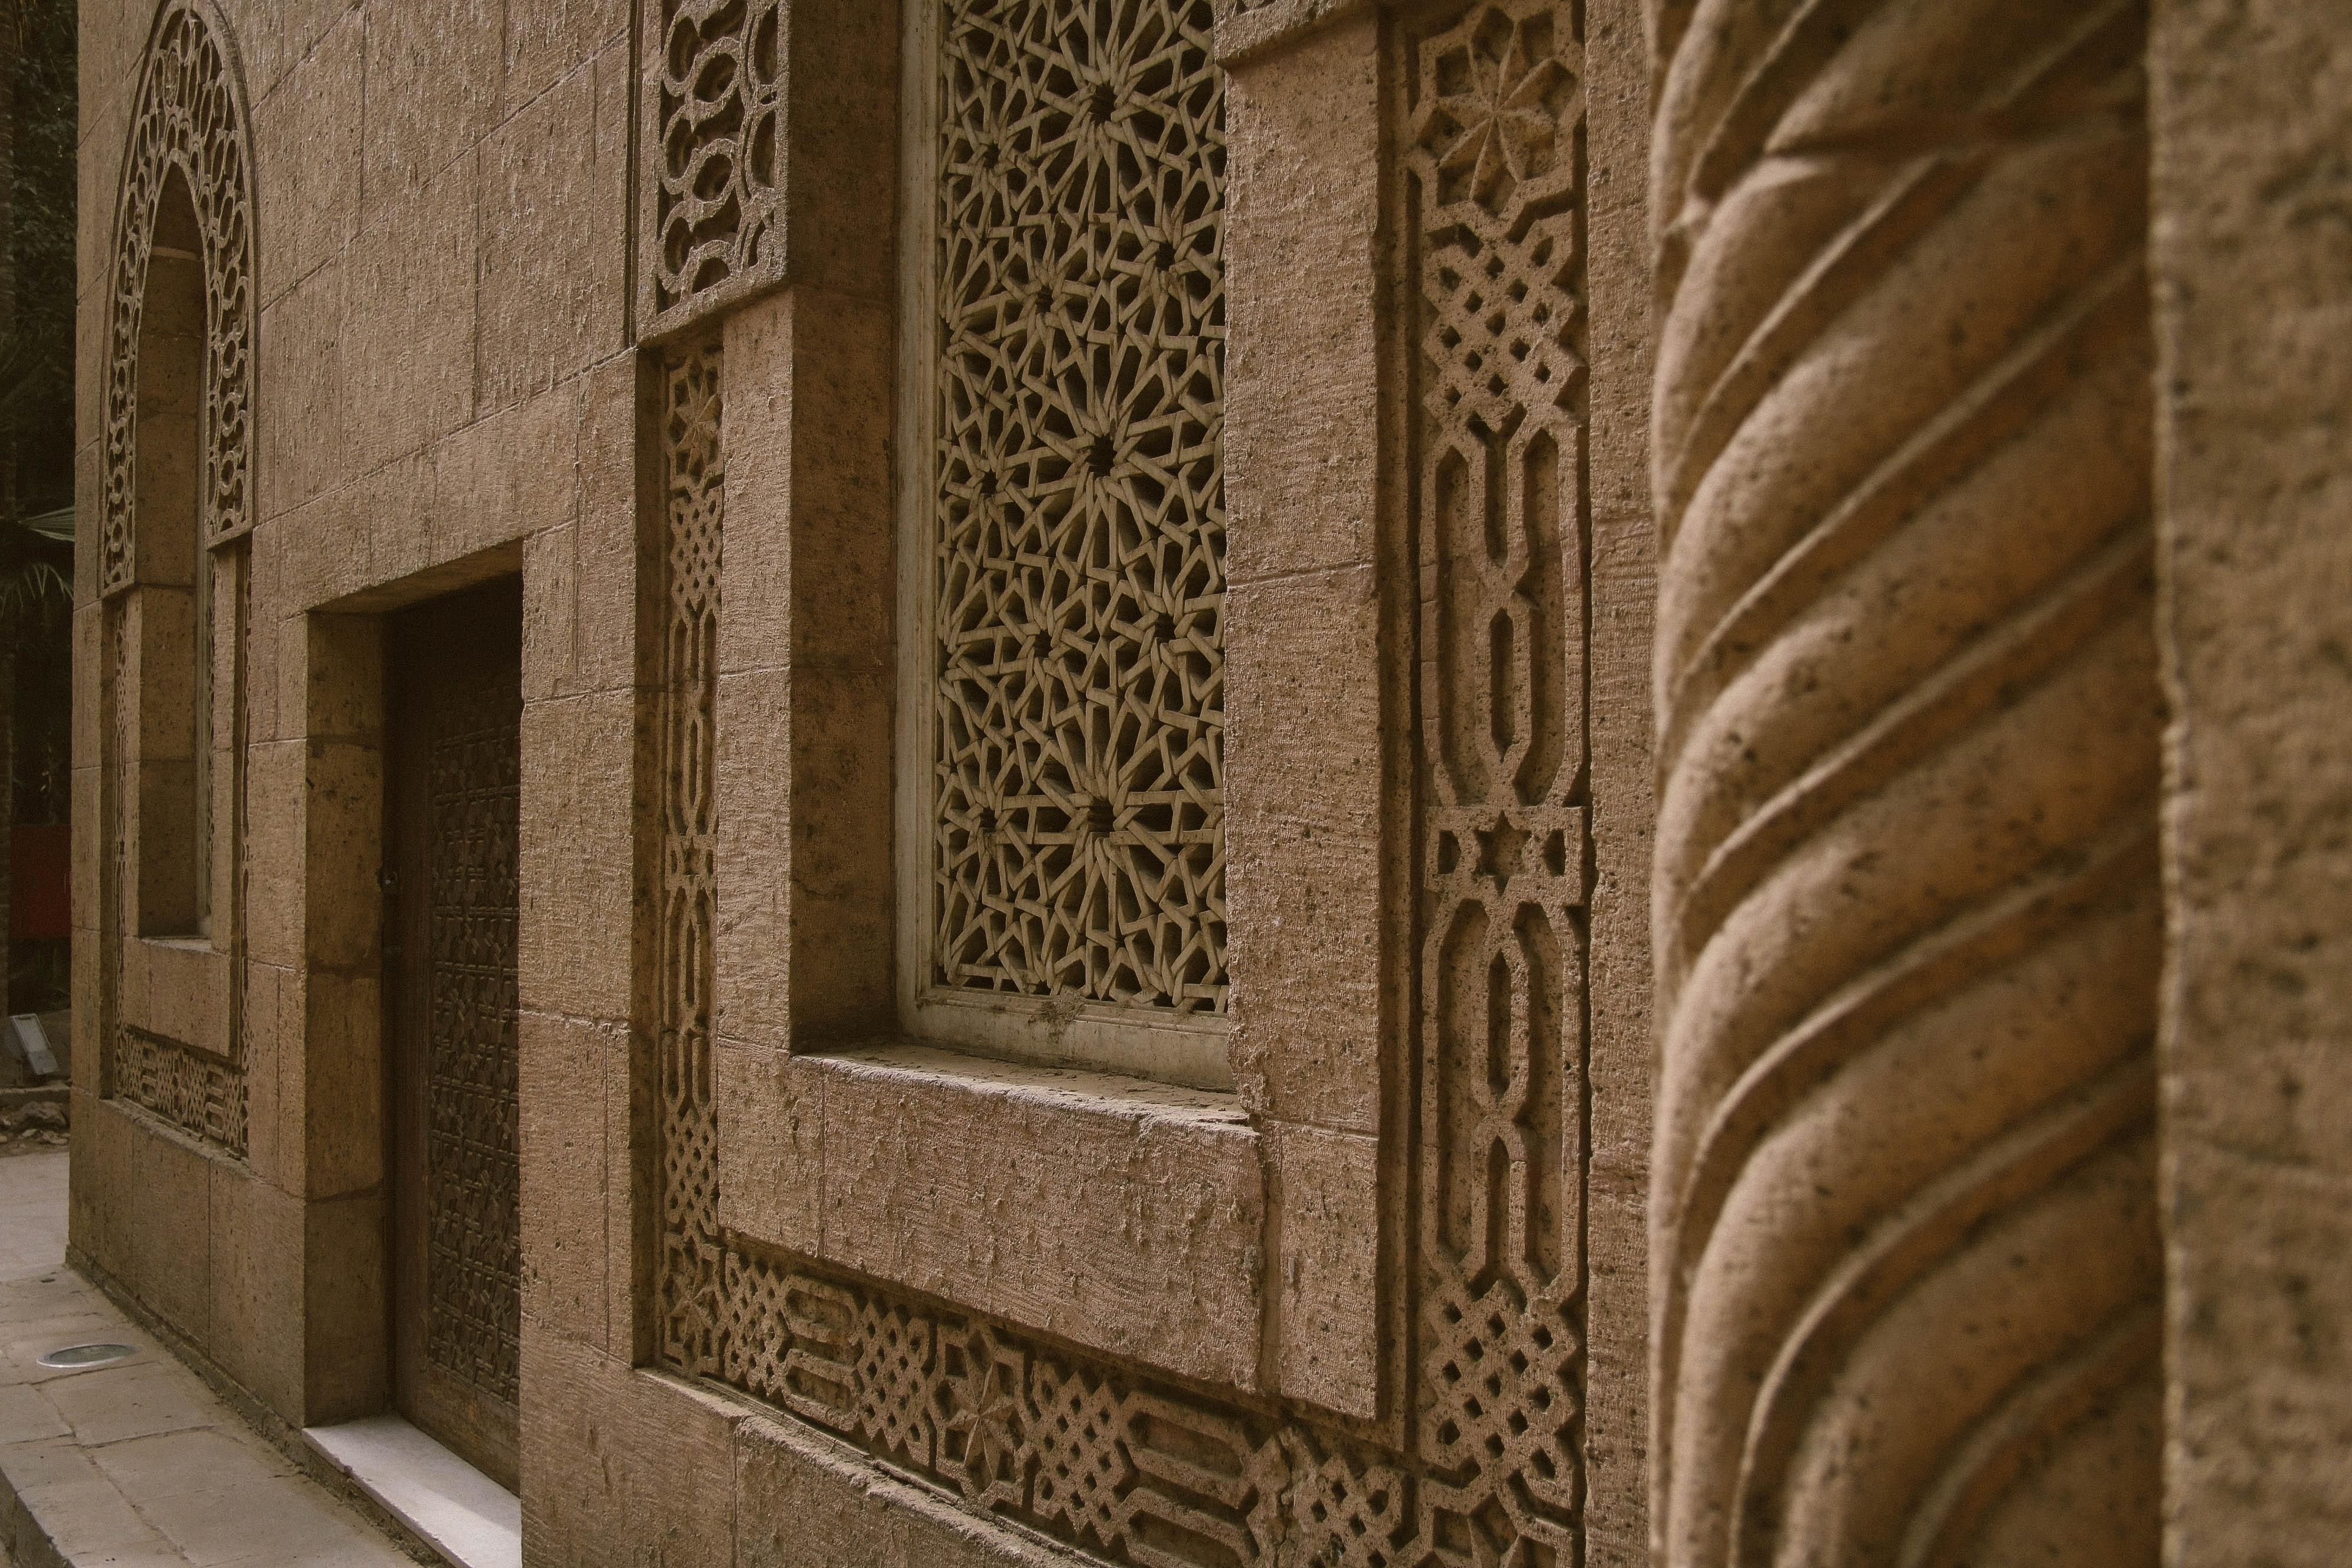 Free Images Ancient Antique Arch Arches Architecture Art